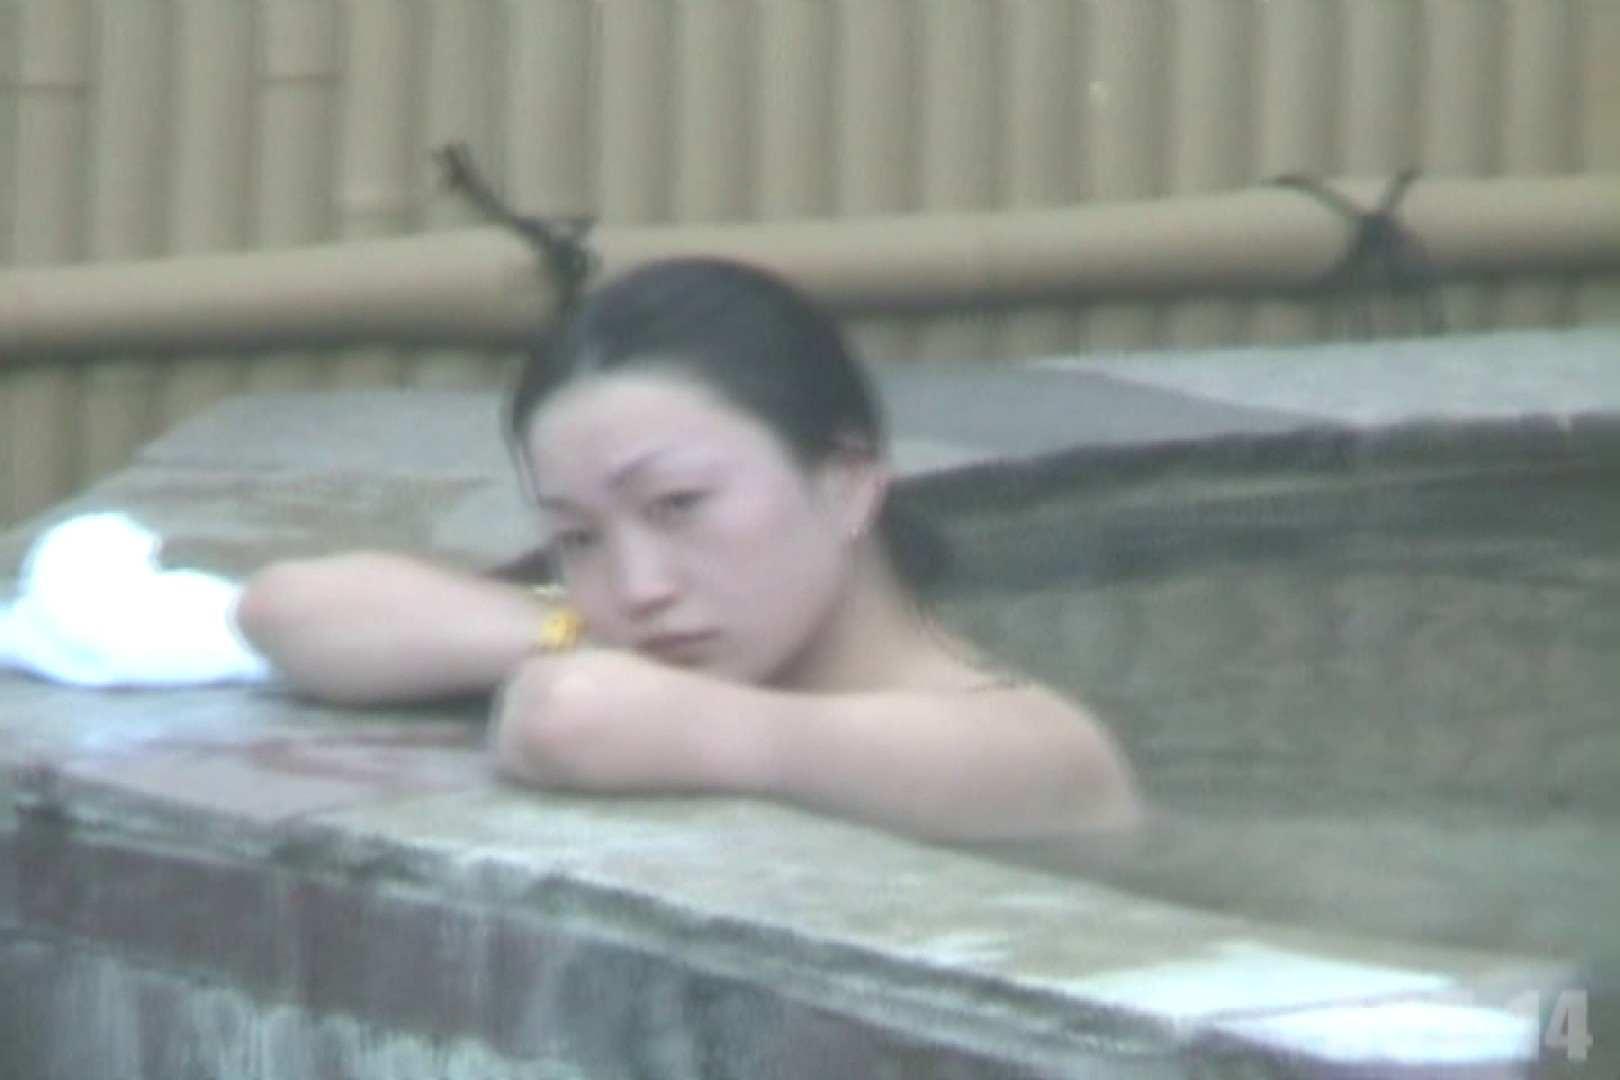 Aquaな露天風呂Vol.826 盗撮  84連発 64